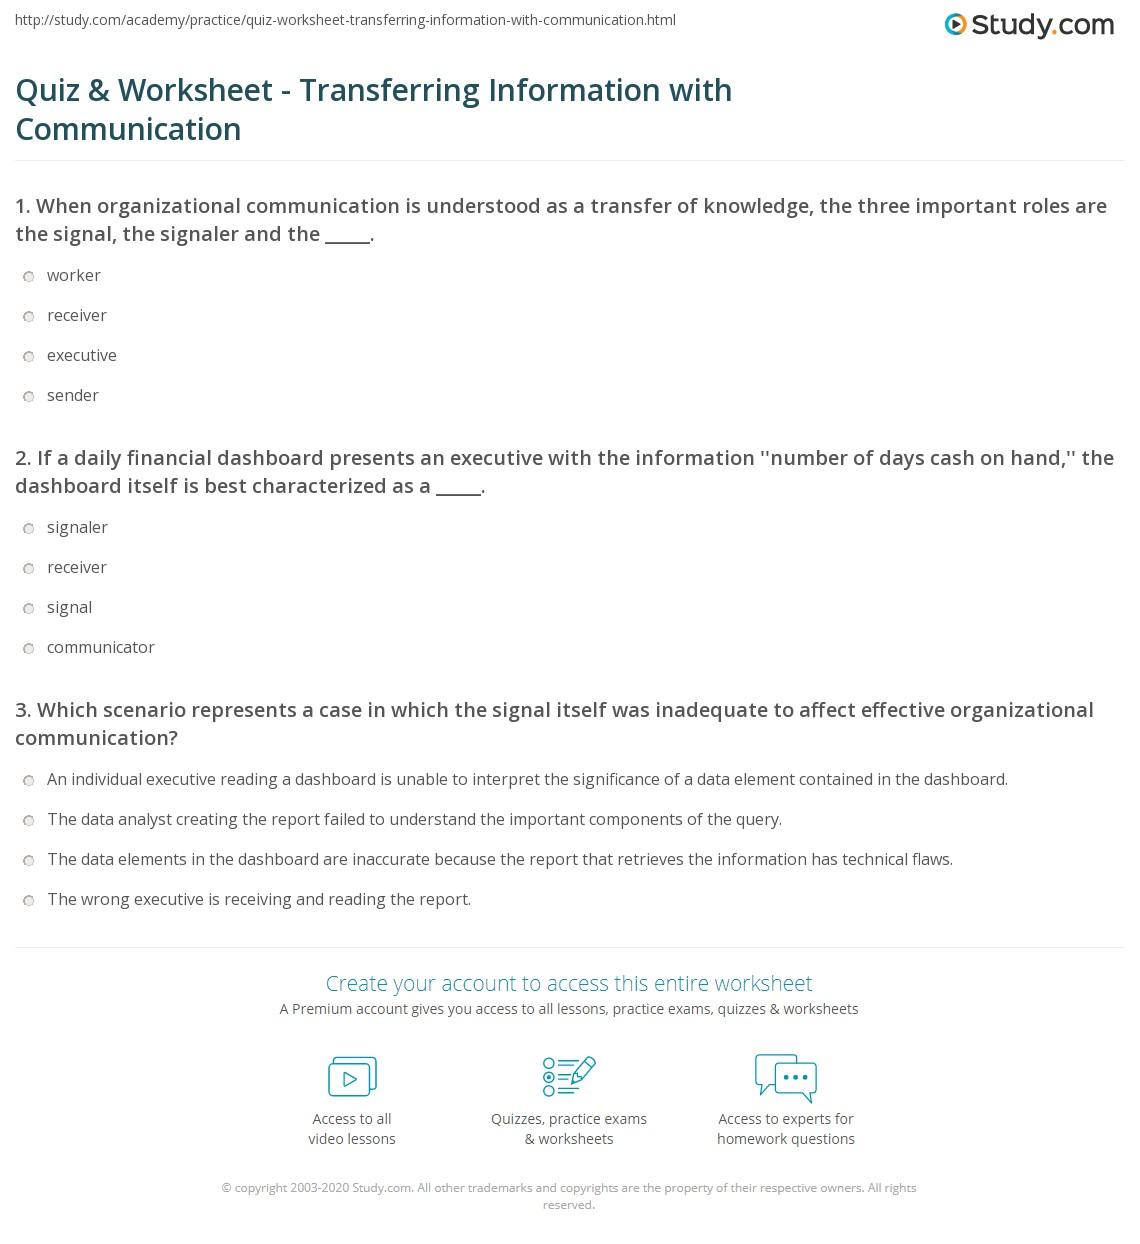 Quiz worksheet transferring information with communication print communication as information transfer within organizations worksheet freerunsca Gallery